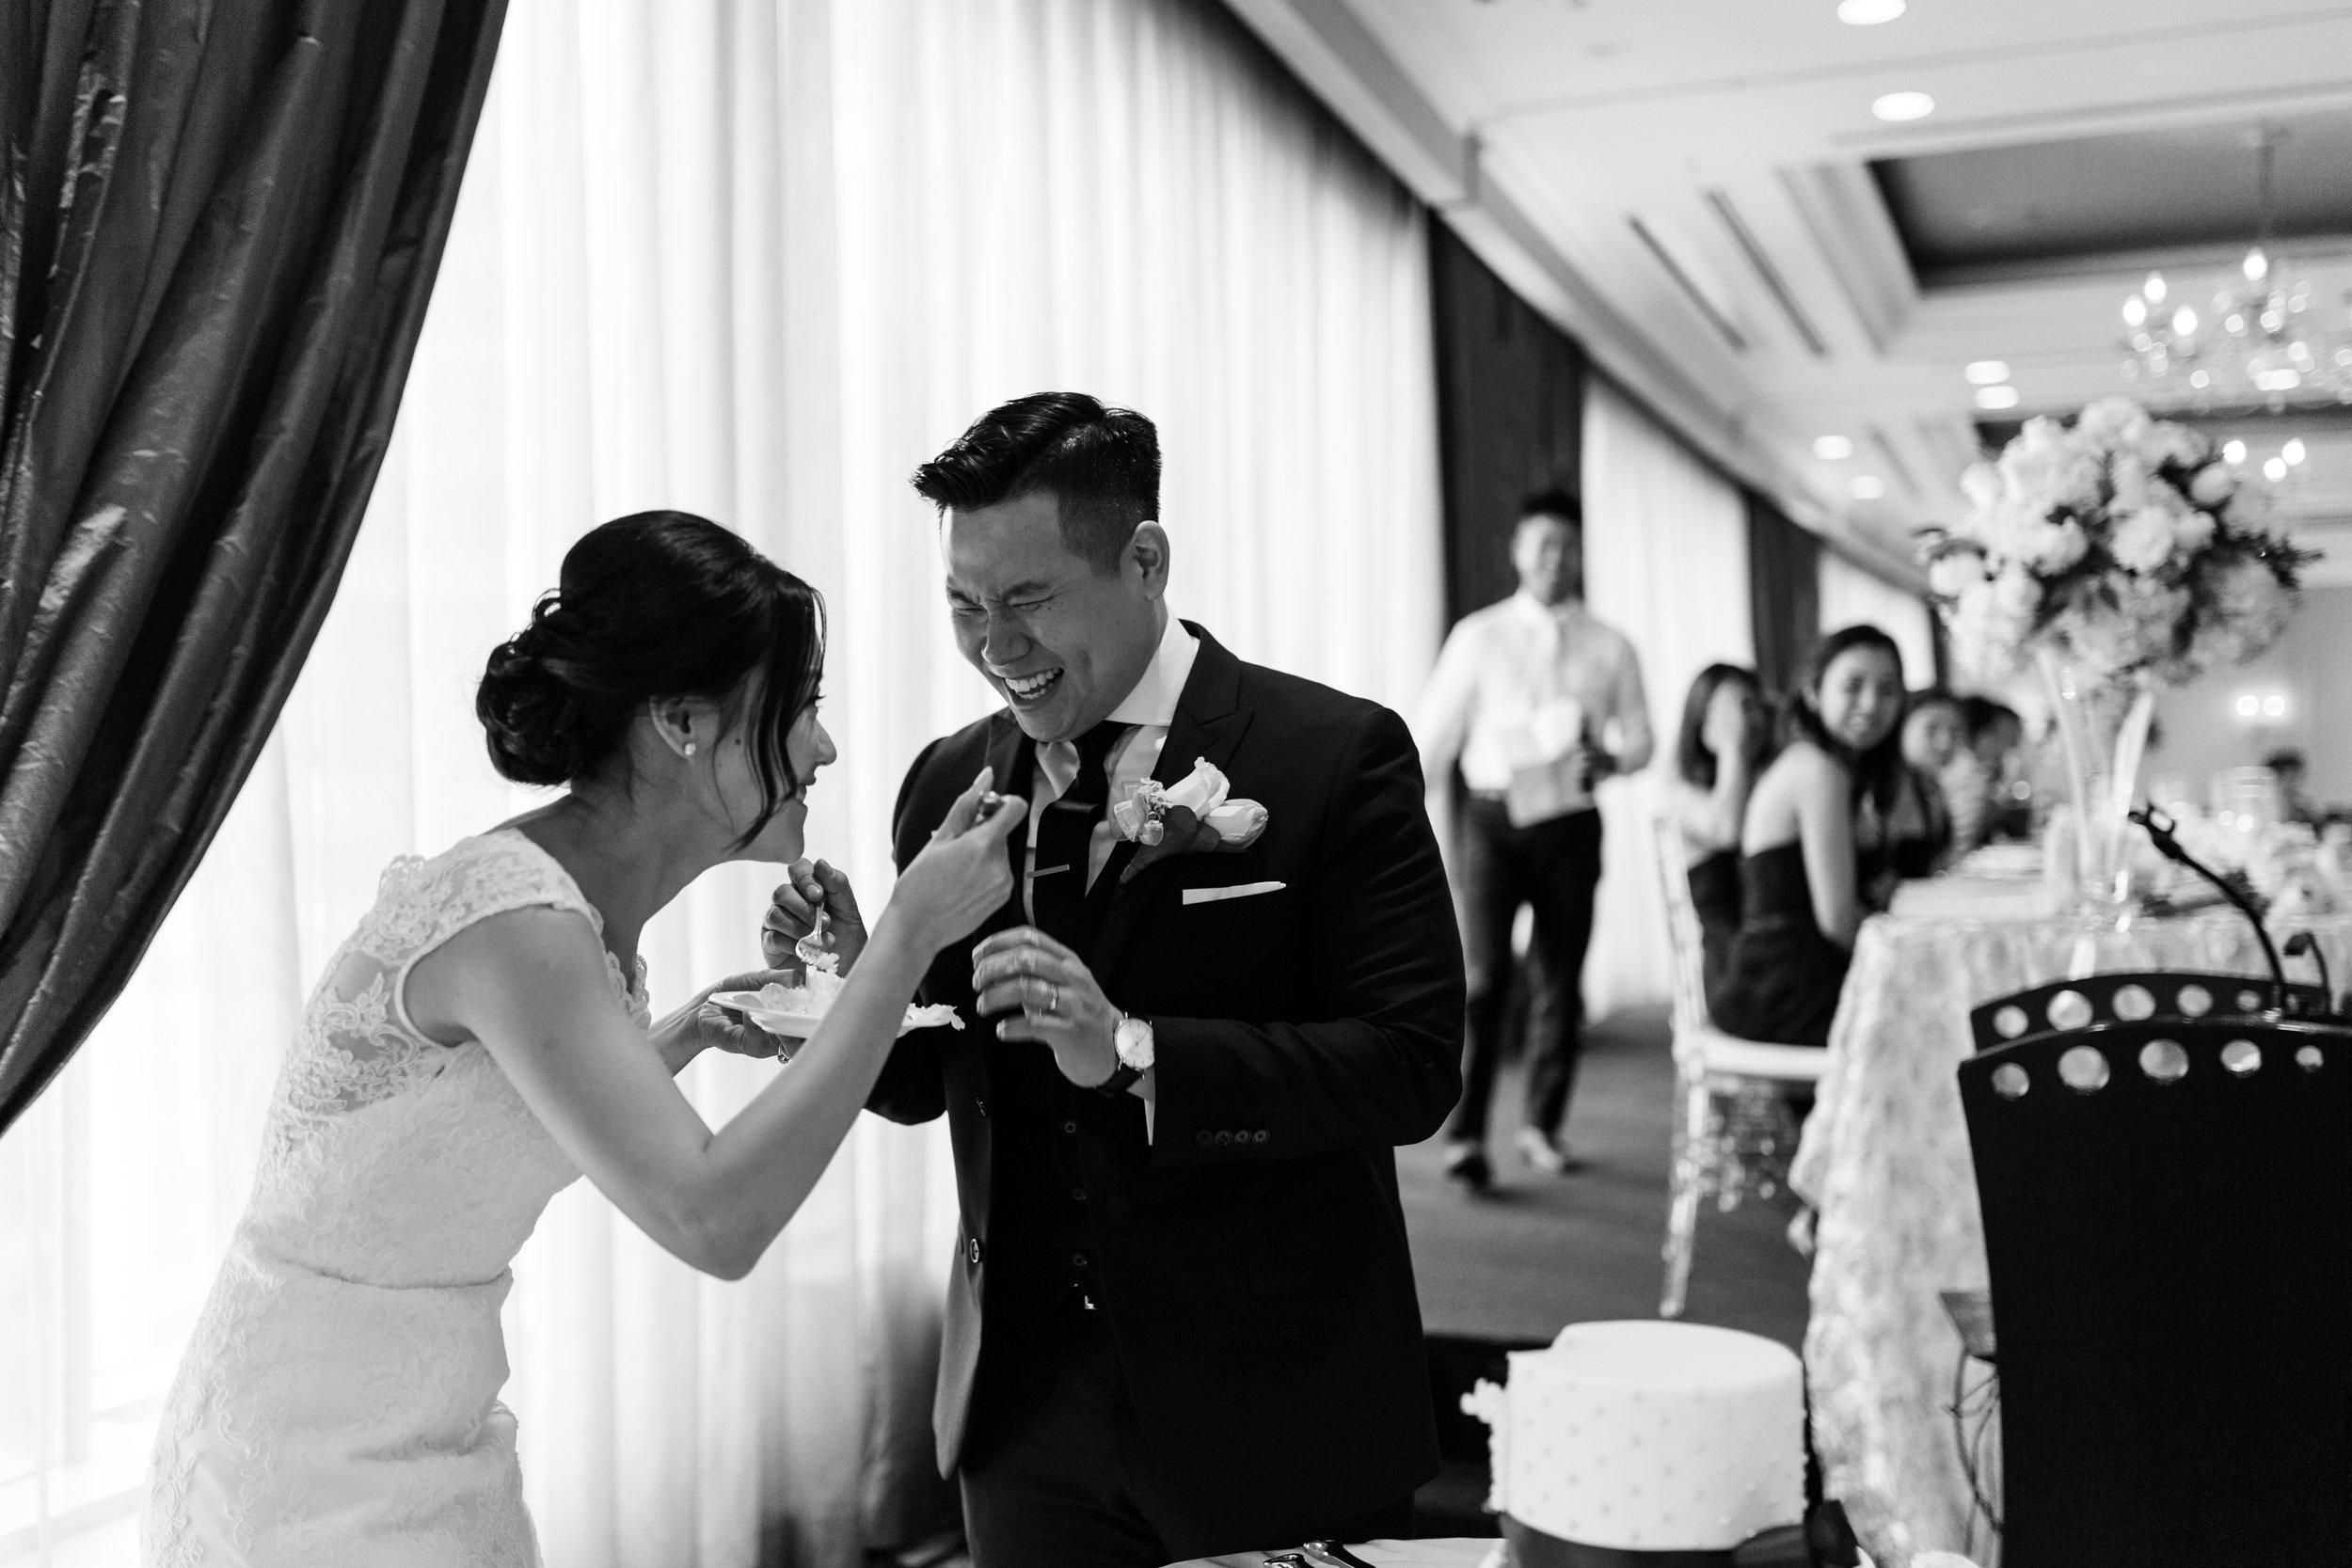 herafilms_wedding_sandy_jon_hera_selects-45.jpg